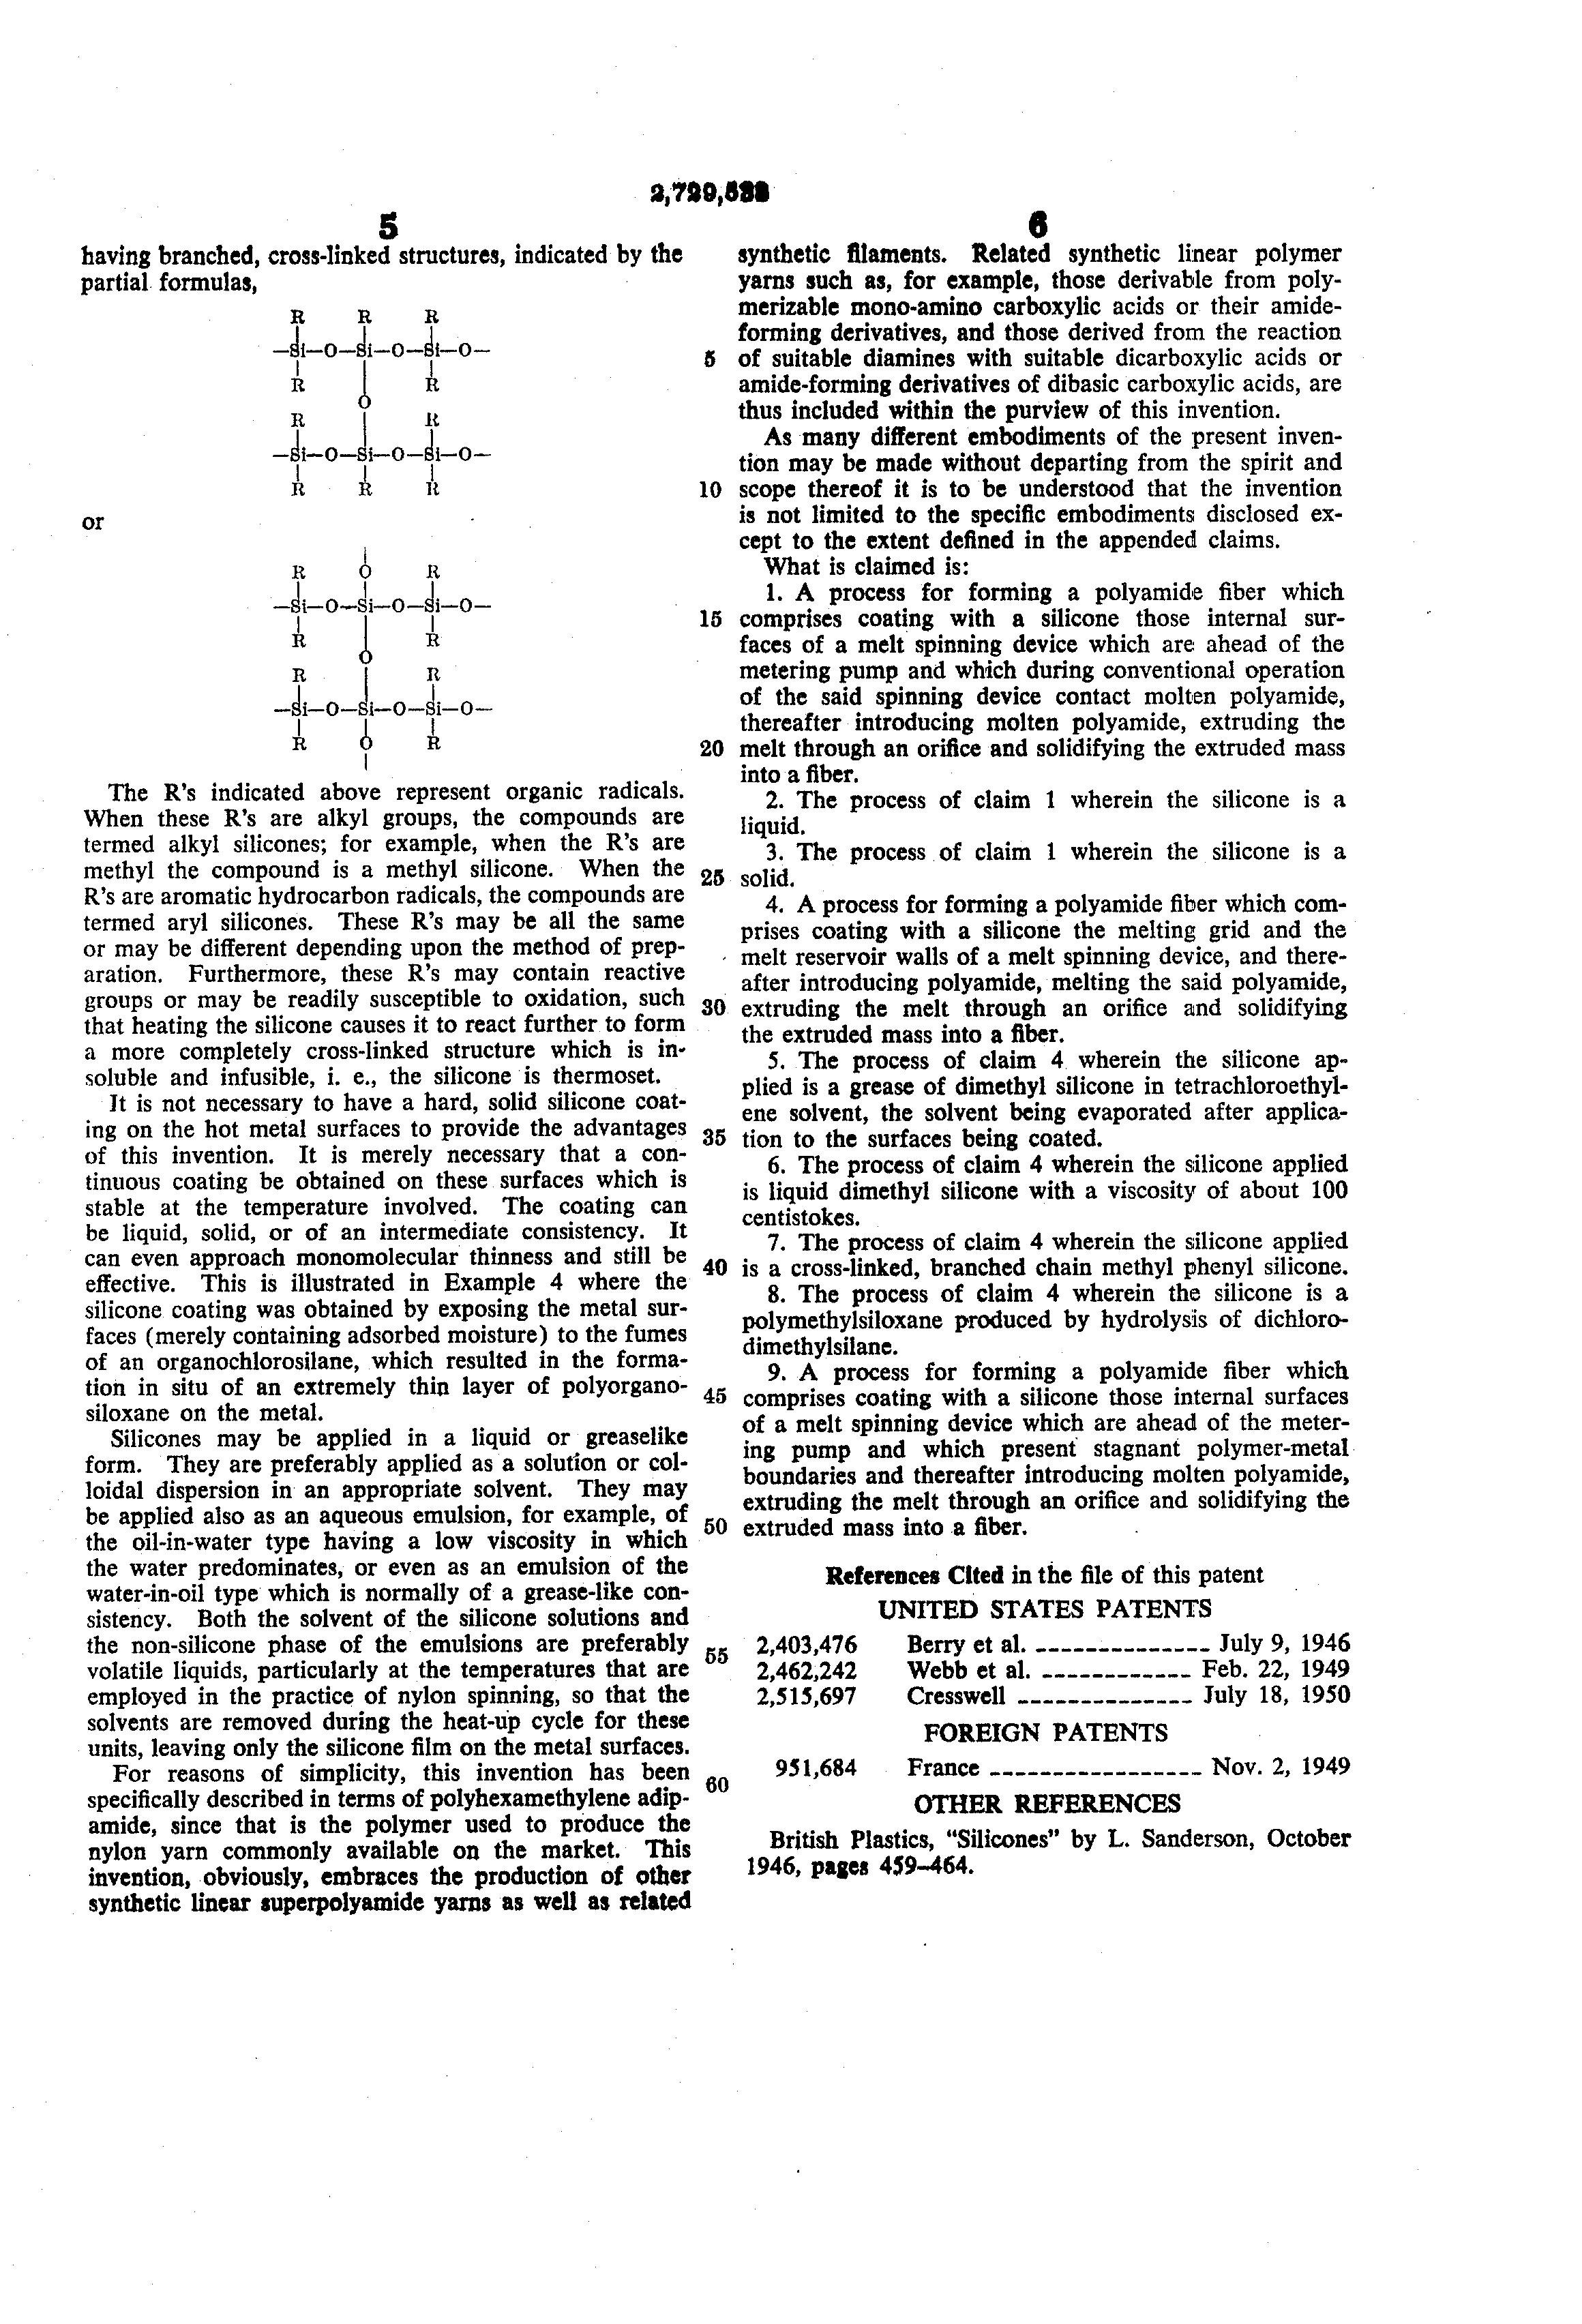 The Basic Nylon Patent Application 58